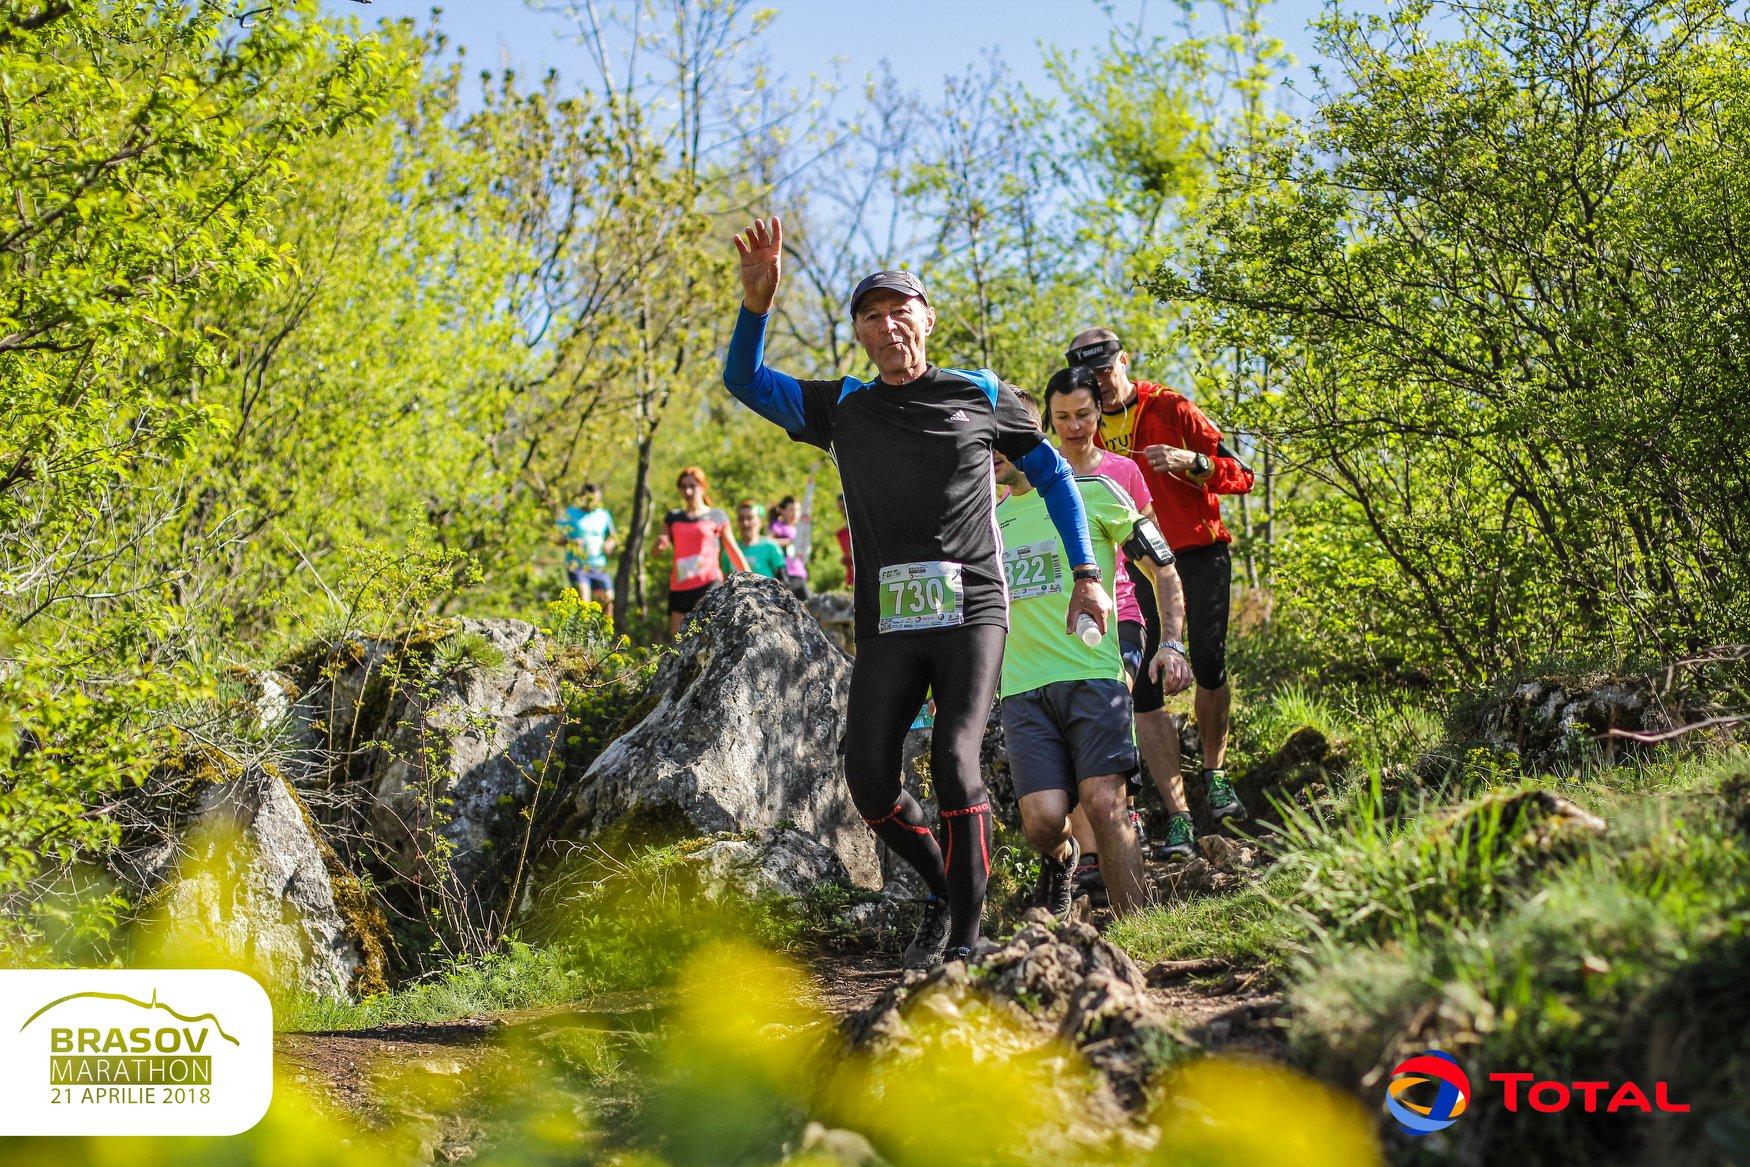 Brasov Marathon 2018